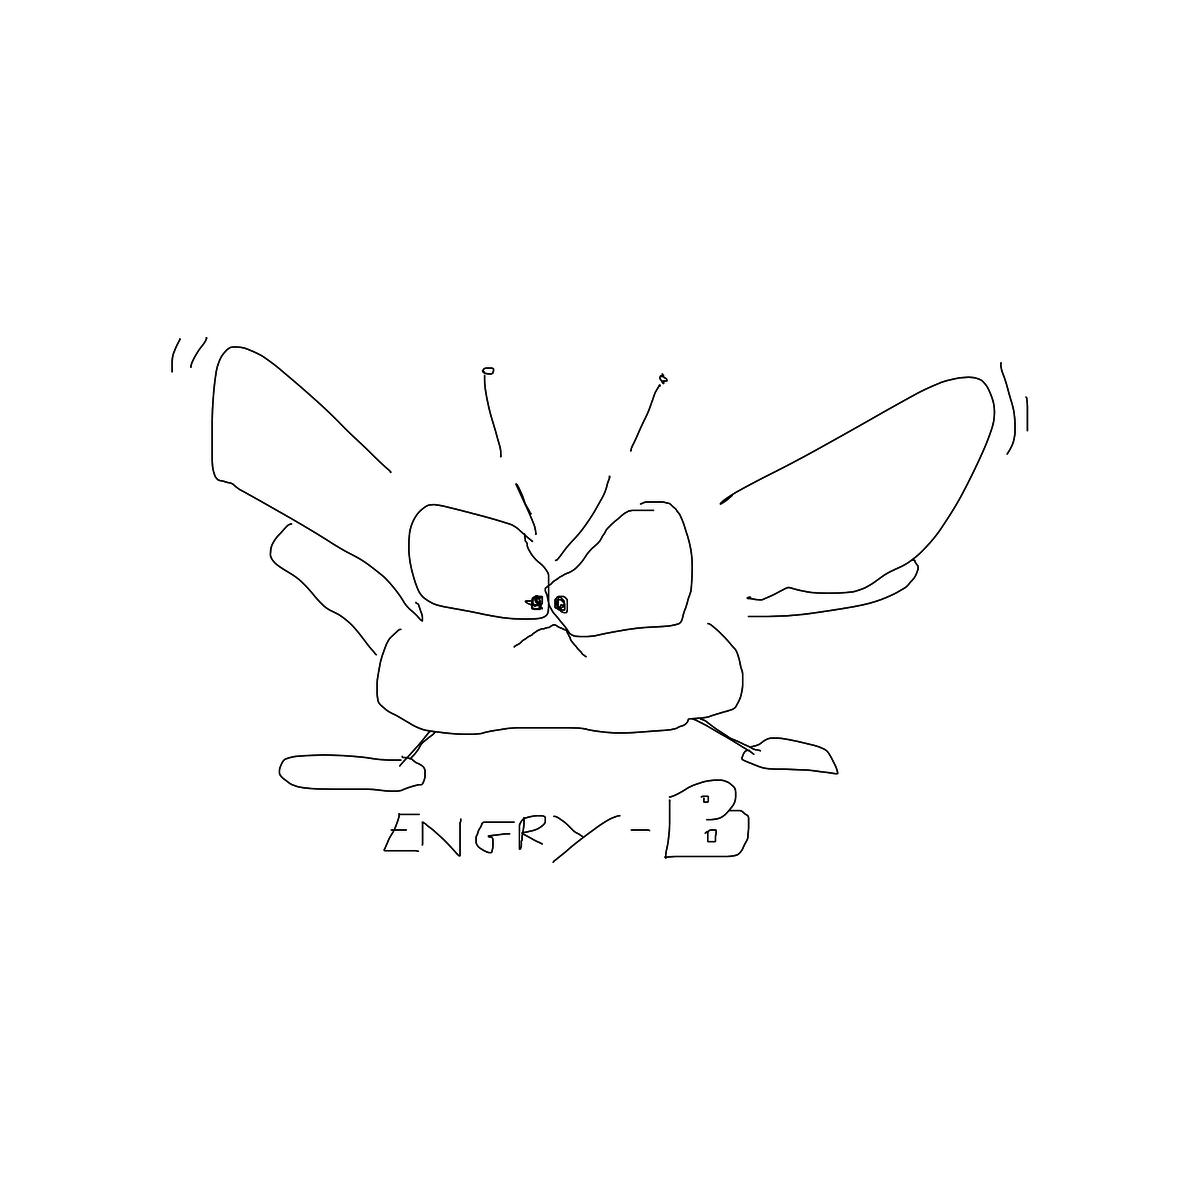 BAAAM drawing#33 lat:52.3487014770507800lng: 13.6428365707397460